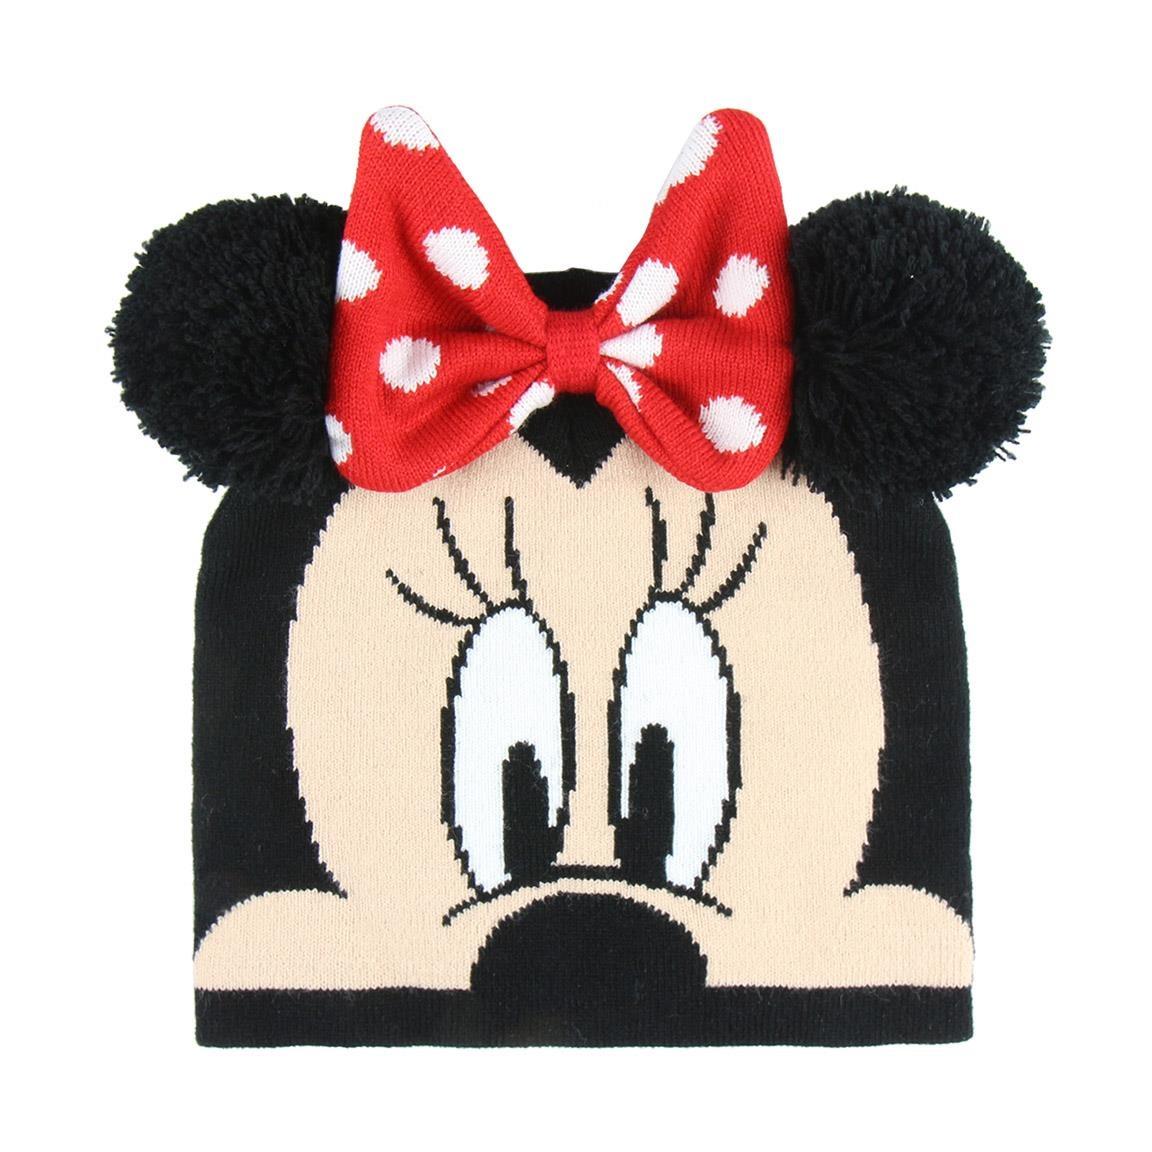 93b3babdcf0 Disney hat Minnie Mouse black girls one size - Internet-Sport Casuals